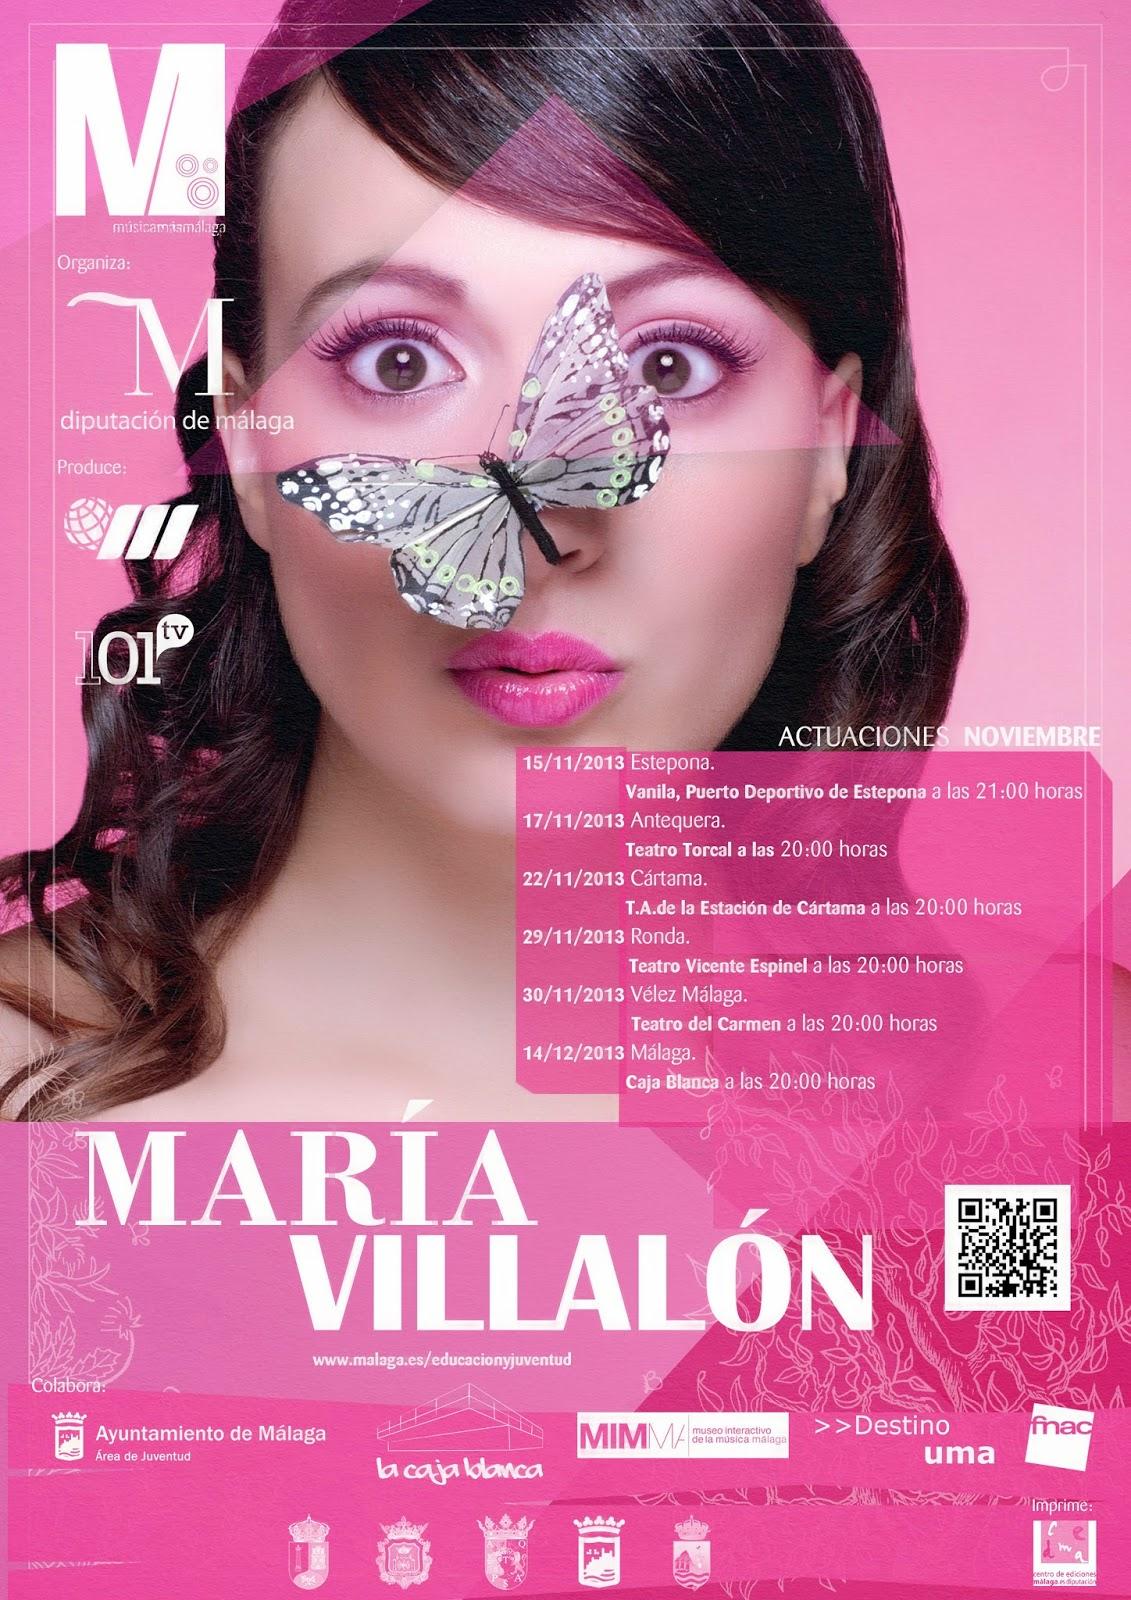 Gira 2012/2013/2014 >> Historias de una Cantonta [FIN DE GIRA] - Página 13 Cartel-Mari%CC%81a-Villalon